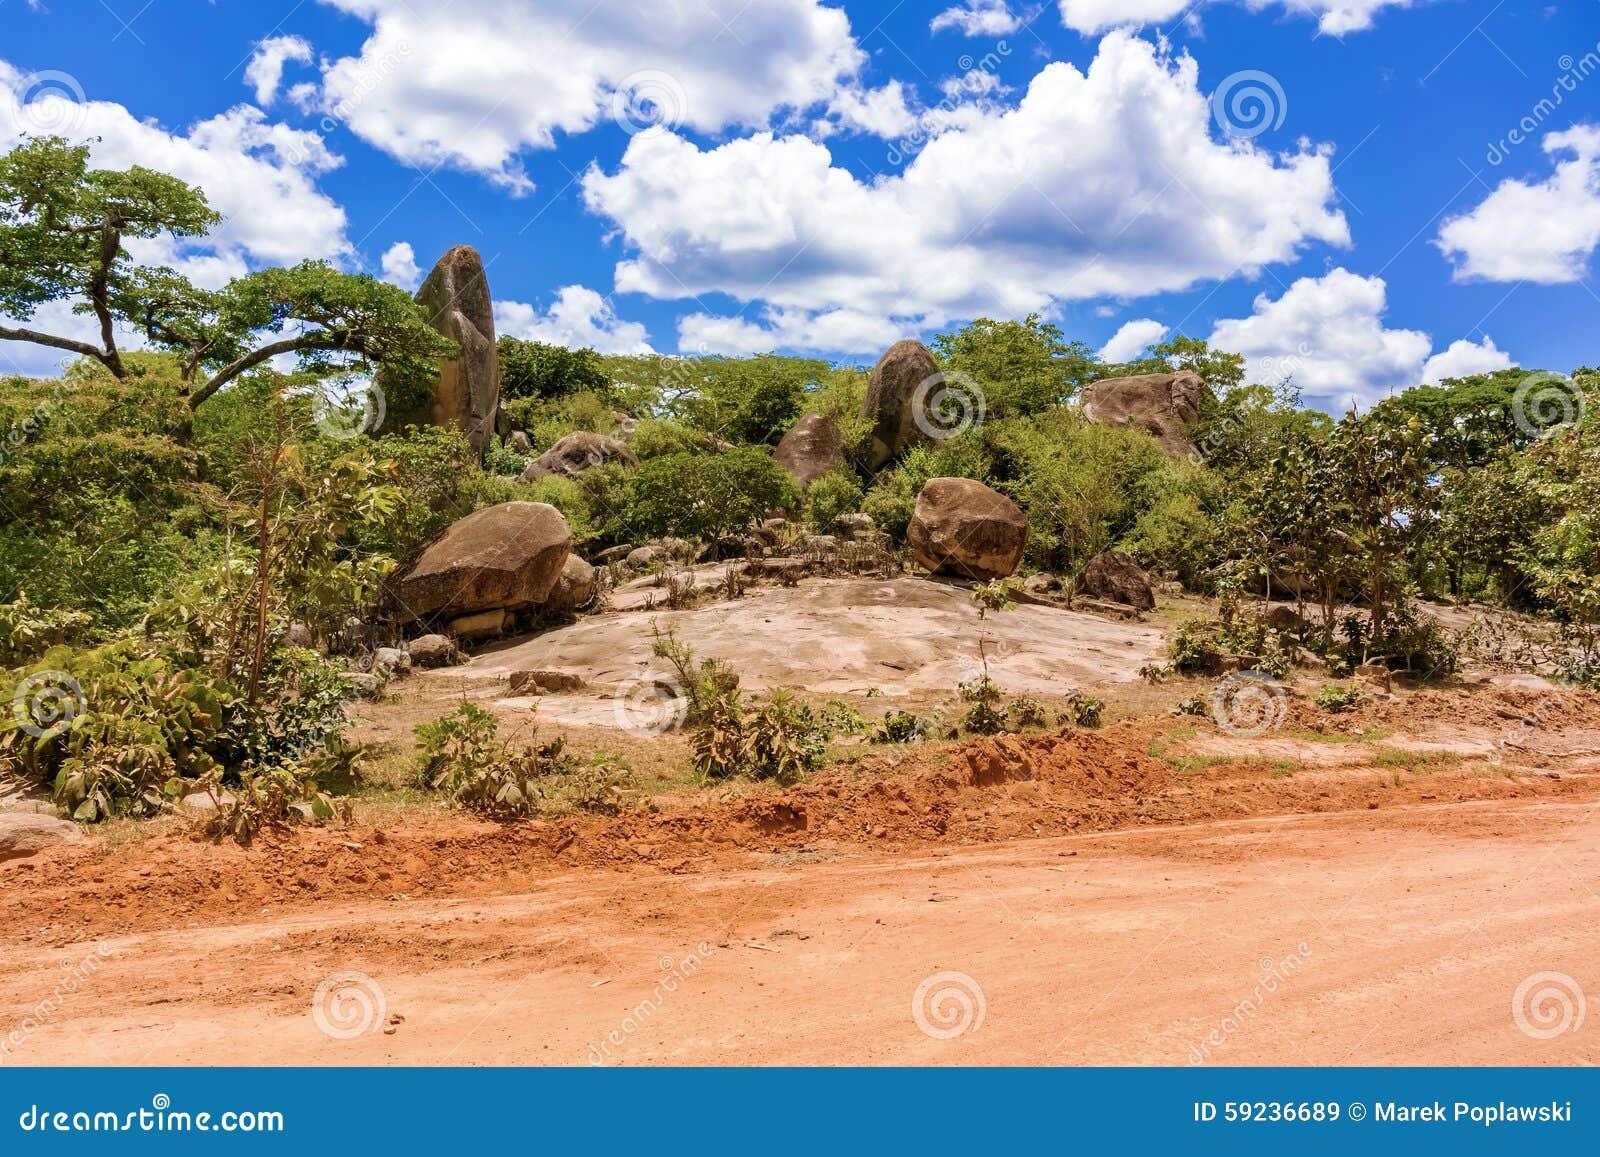 Download Paisaje en Tanzania imagen de archivo. Imagen de horizonte - 59236689